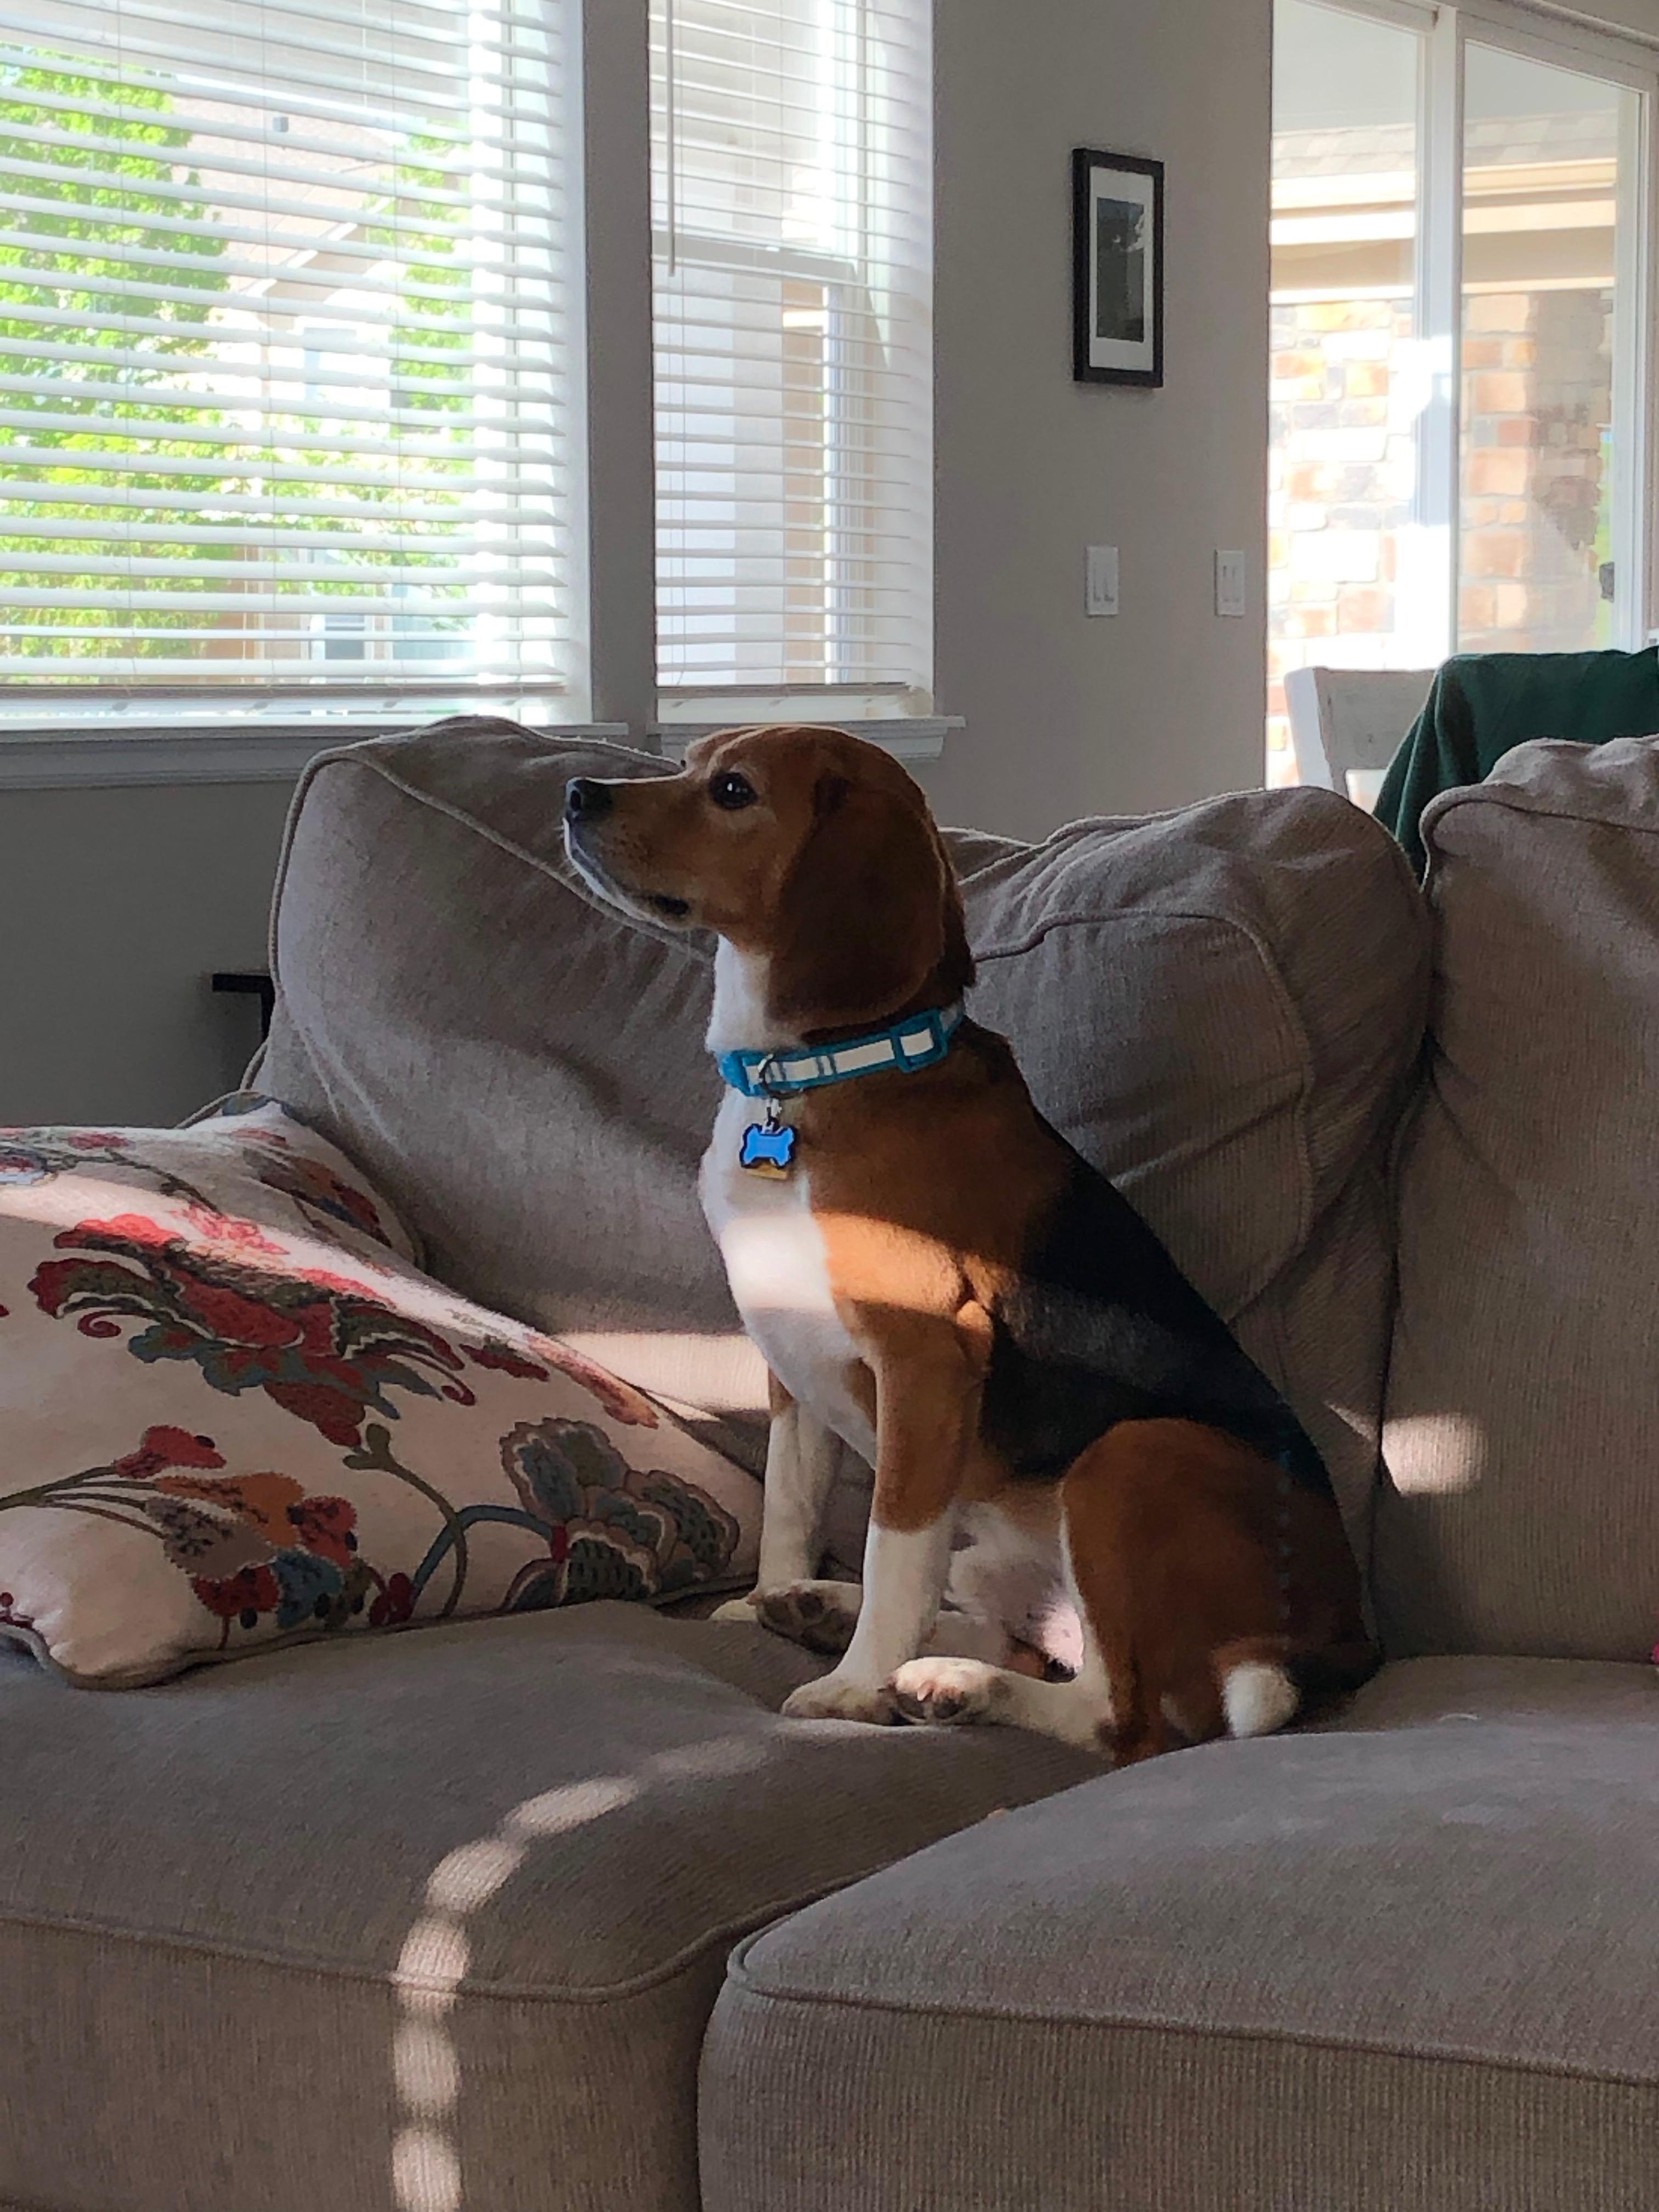 Pin By Rickey Smith On Beagles Beagle Dogs Adoption